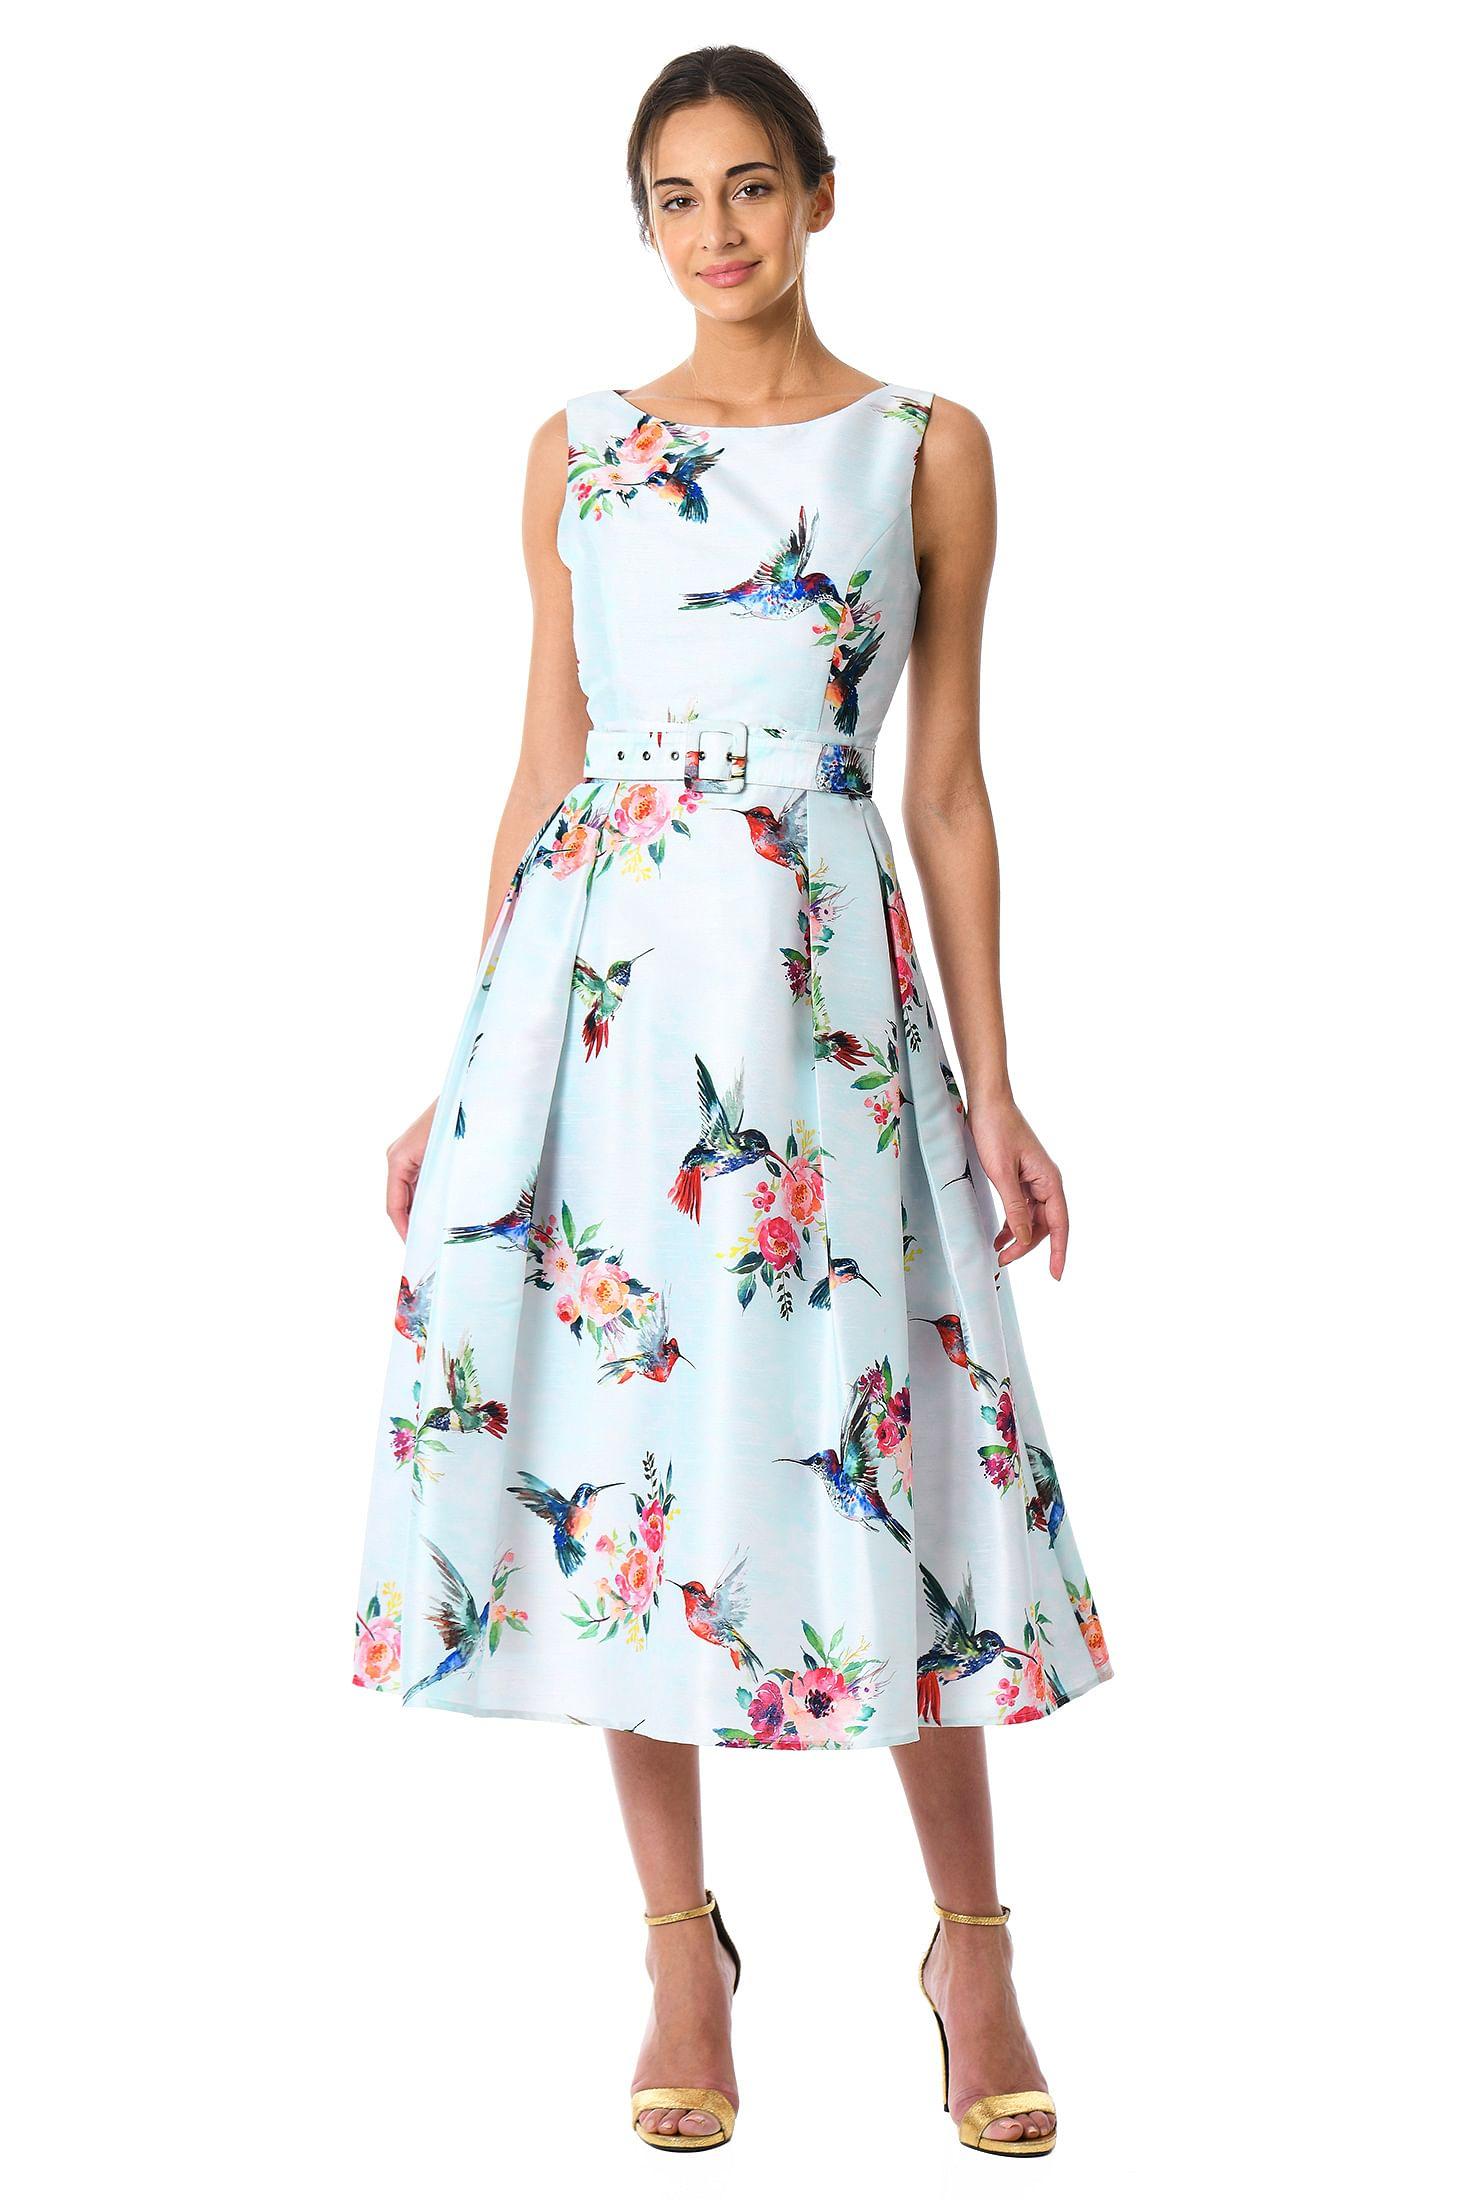 bab911f04a54 back zip dresses, belted dresses, boat neck dresses, Dry clean dresses,